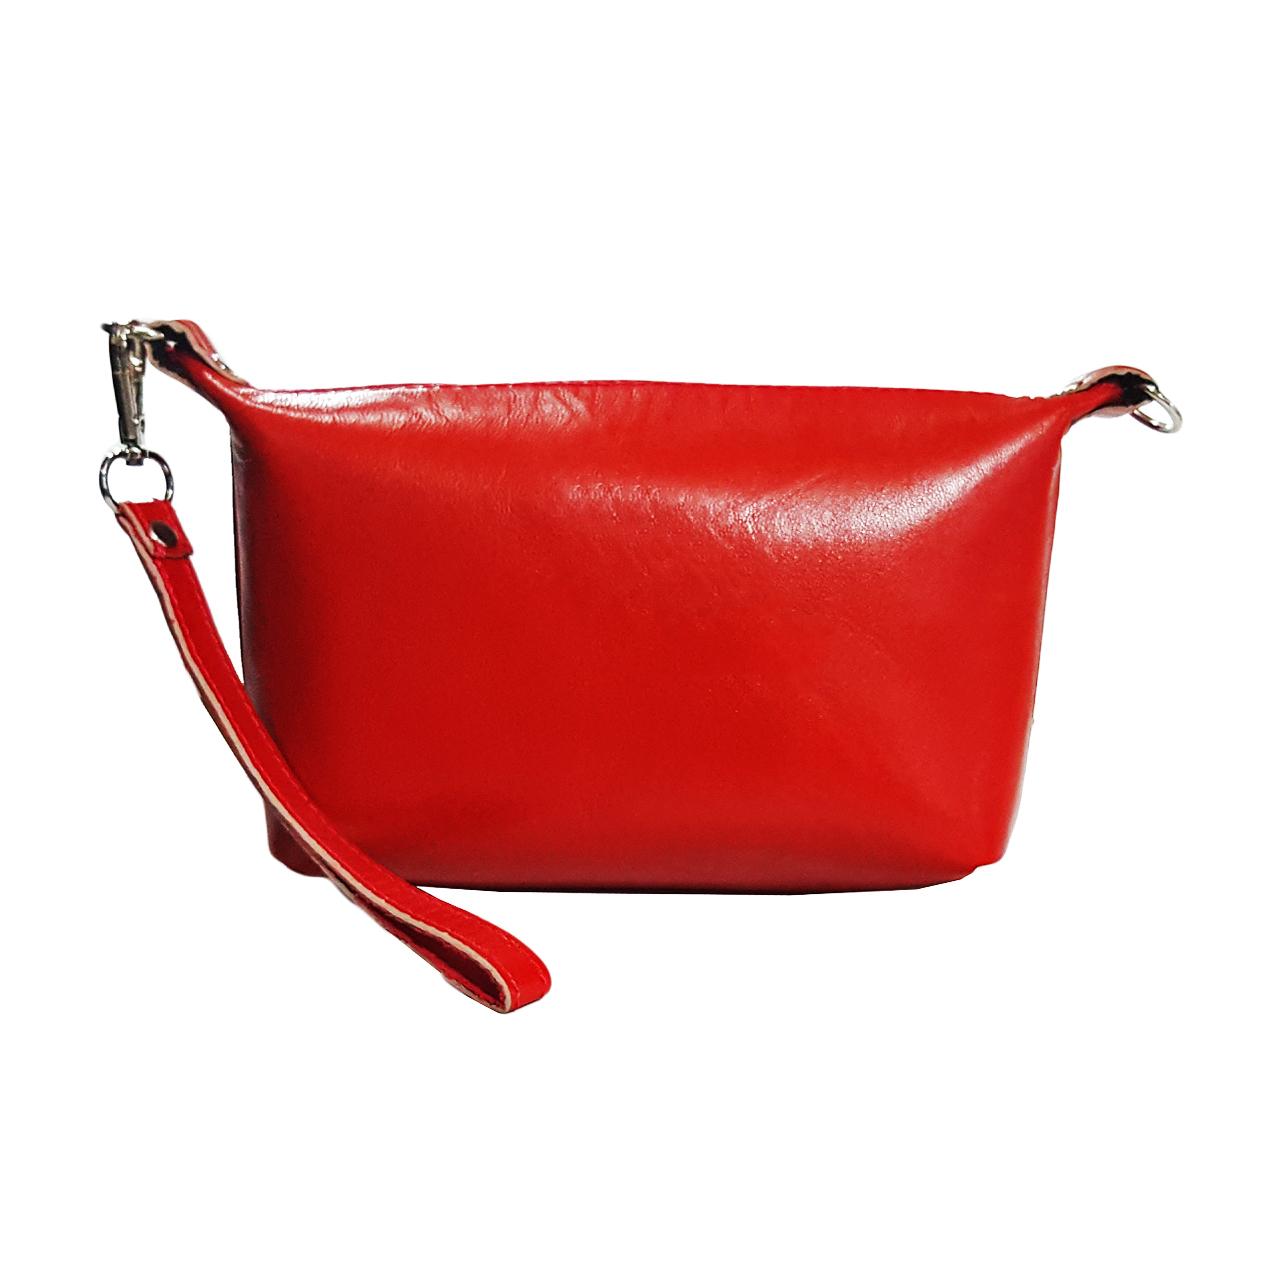 کیف لوازم آرایش زنانه کد 720-1